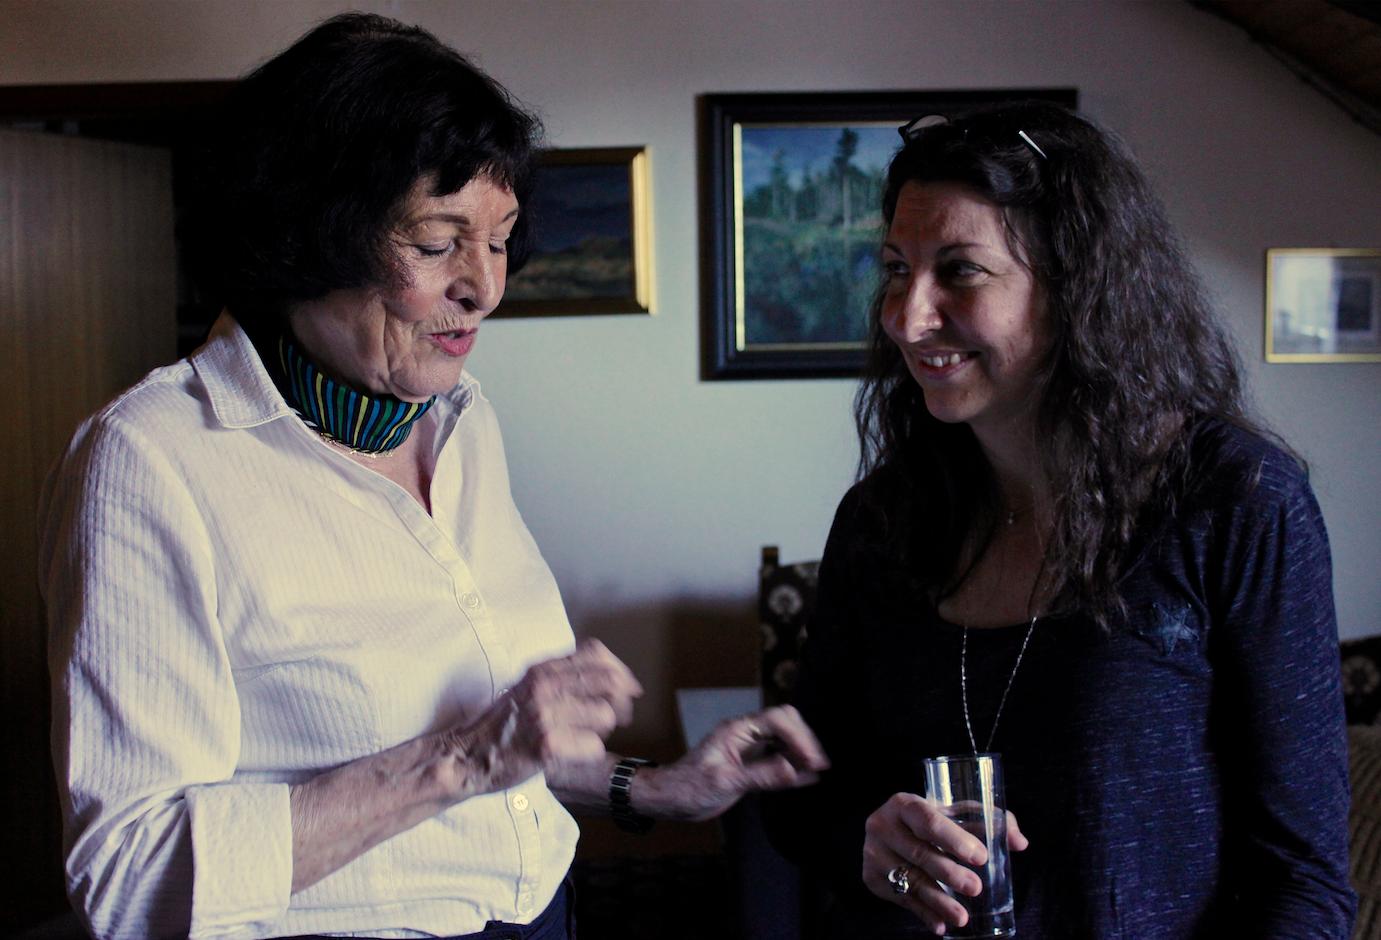 Carmen Scheifele de Vega und Belinda